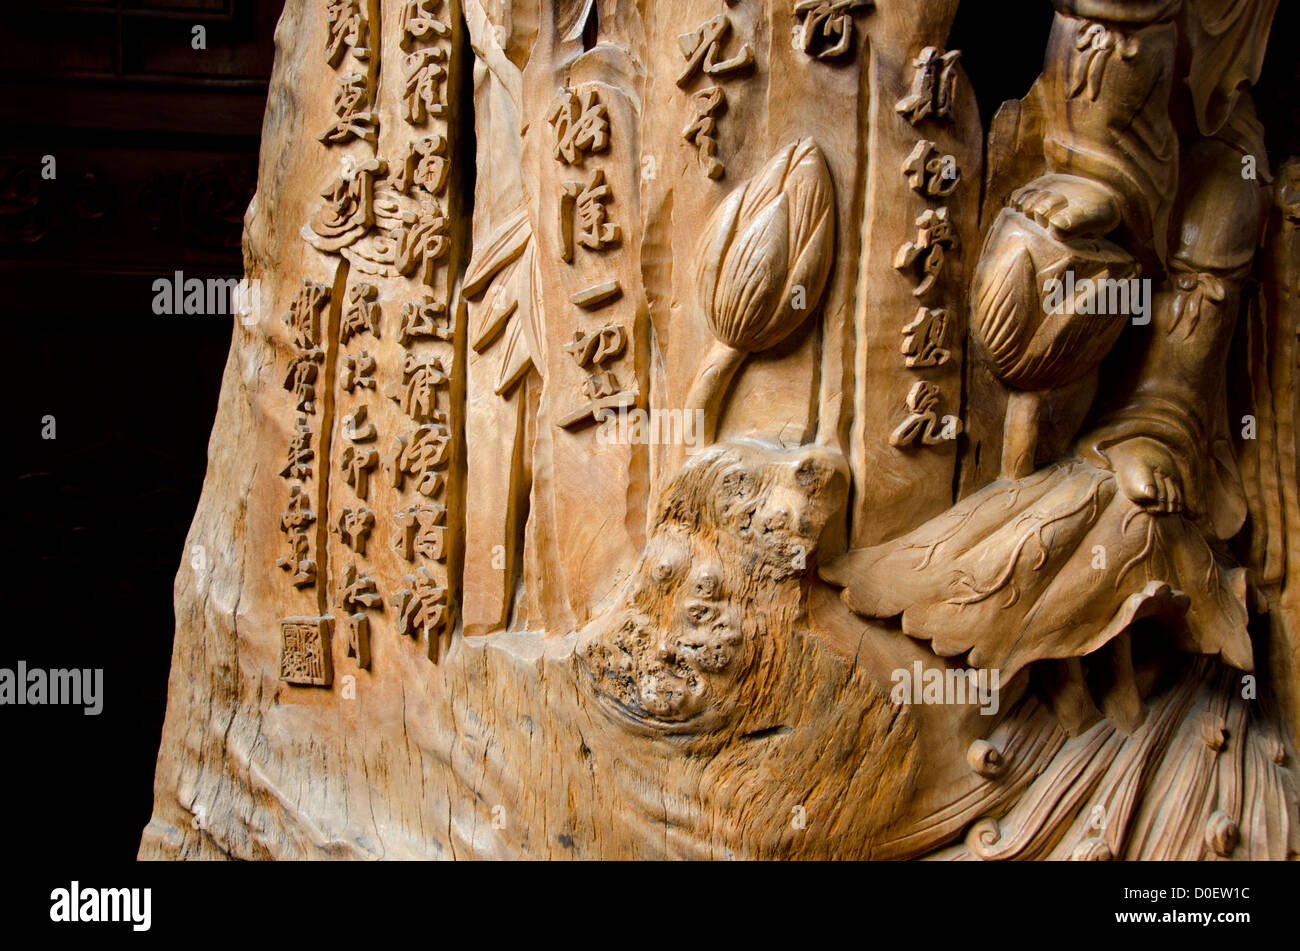 China shanghai jade buddha temple ancient wood carving with china shanghai jade buddha temple ancient wood carving with chinese symbols and lotus flowers buycottarizona